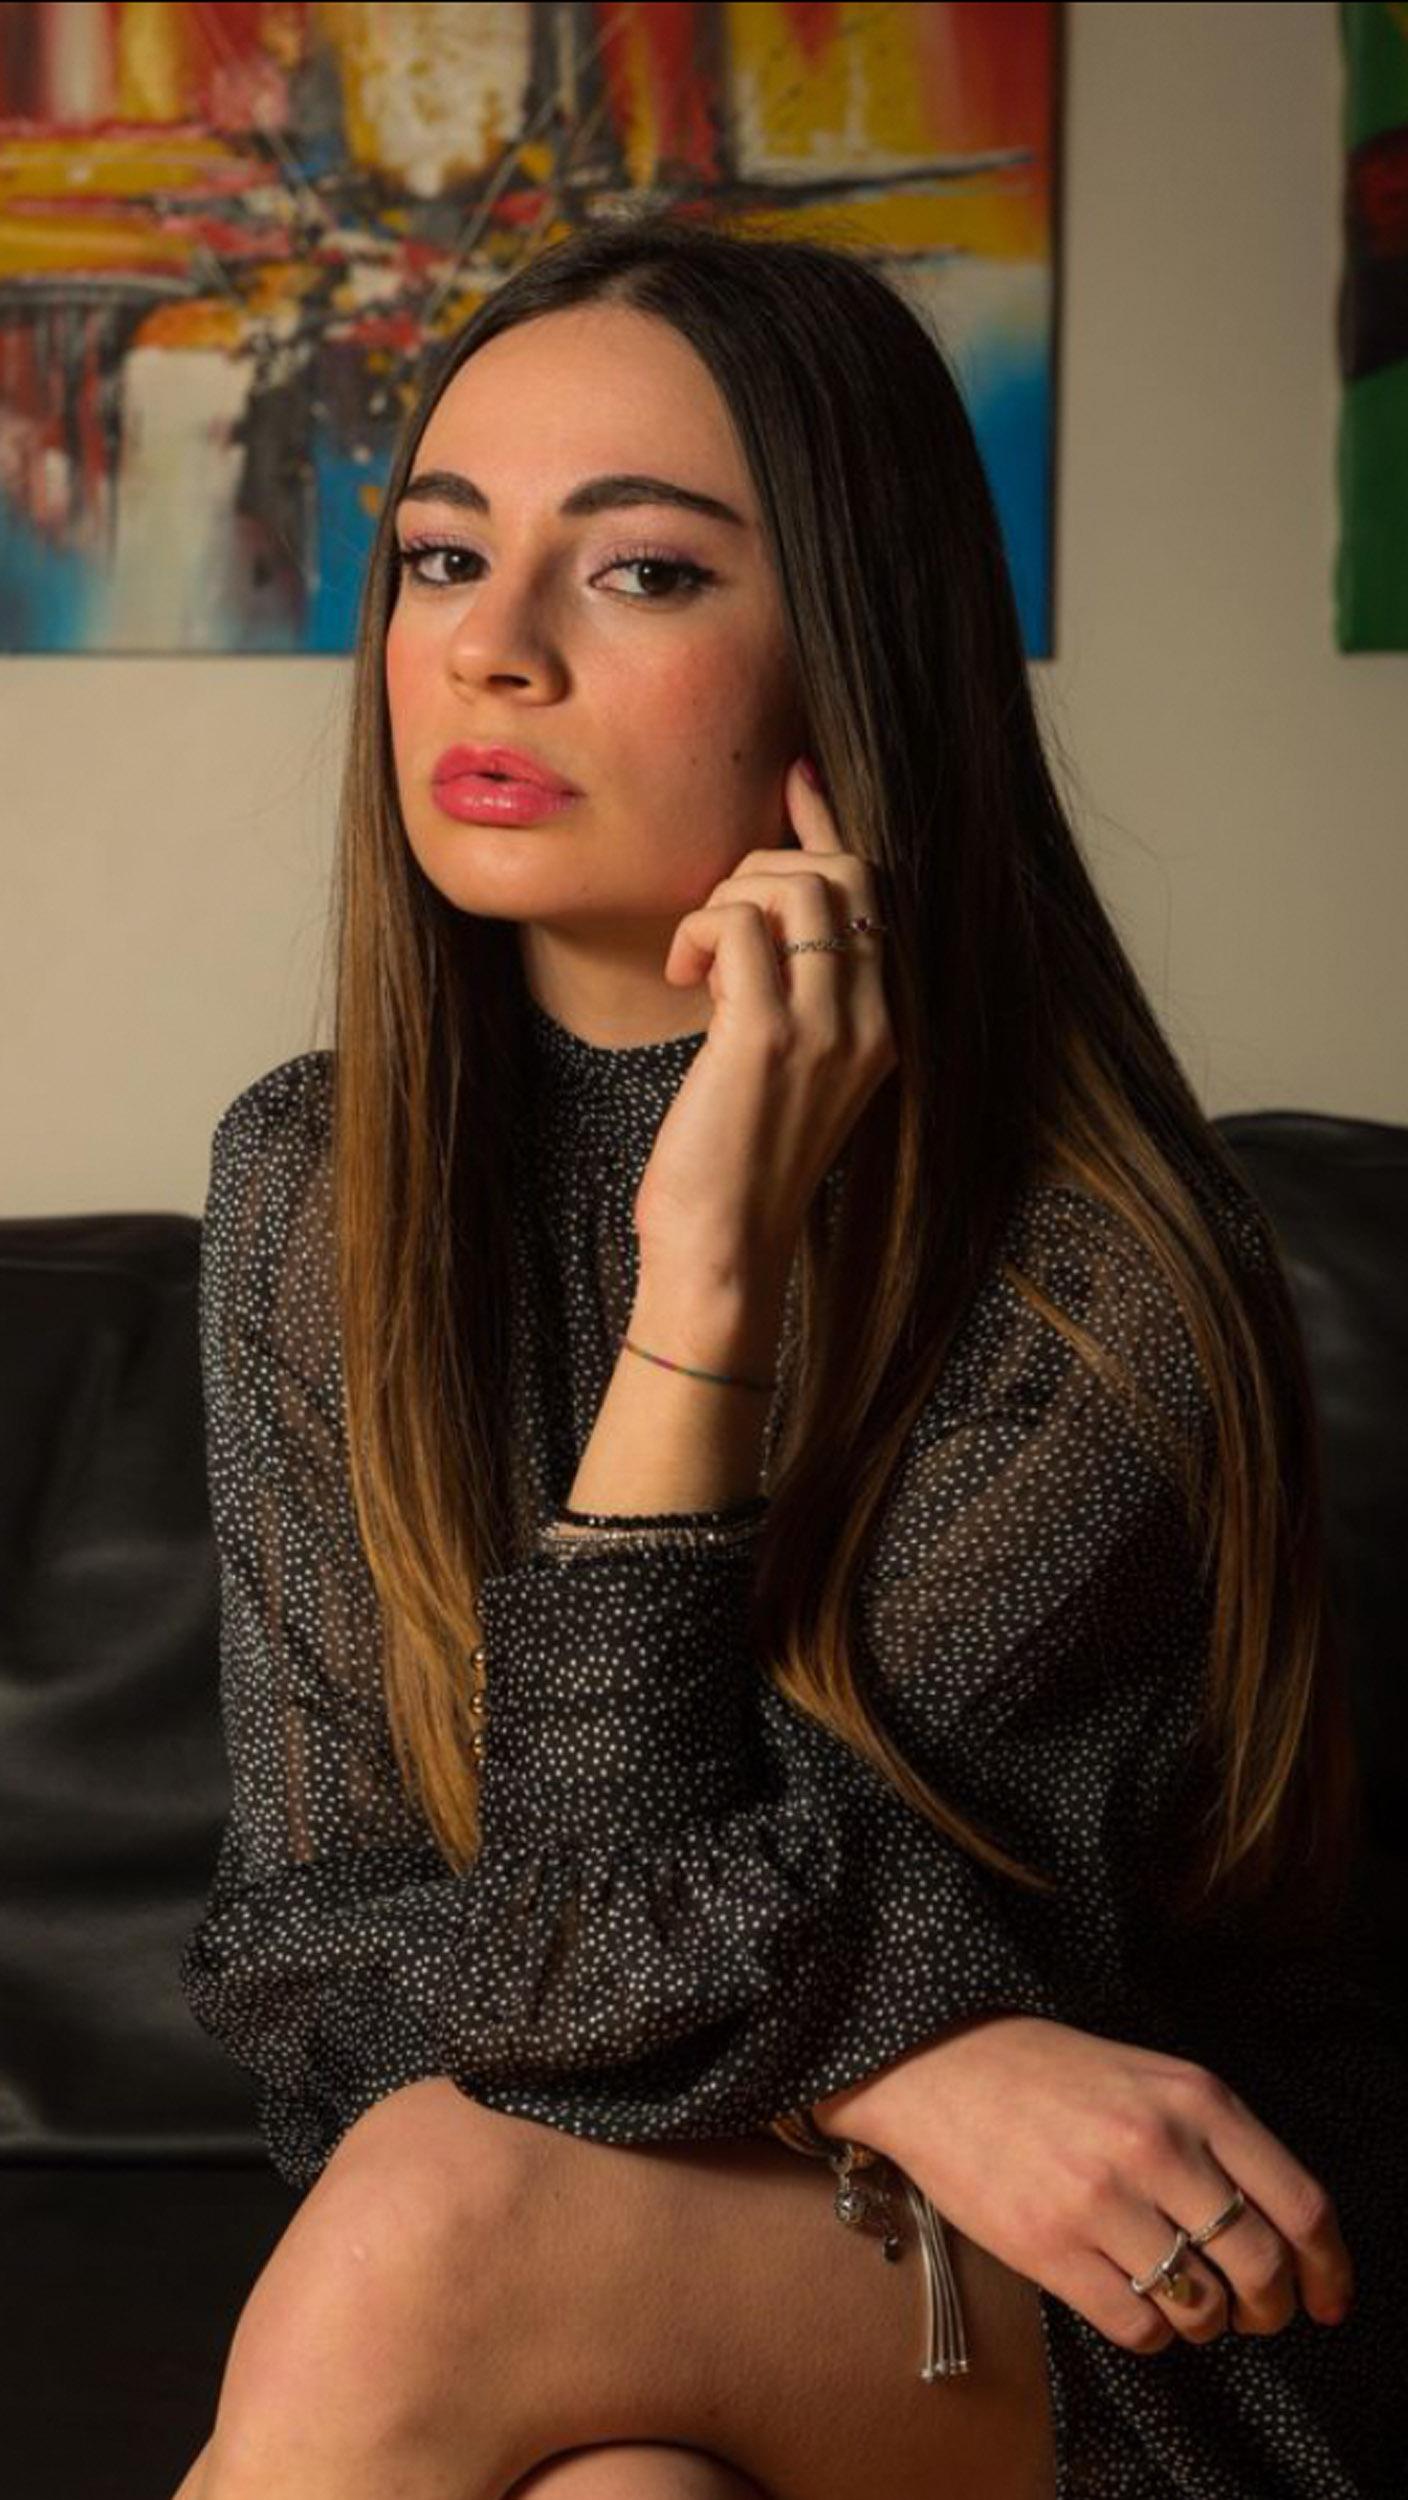 Categorie: Portrait, Glamour- Ph: VITO RAVO- Model: SHARON SAVINO - Location: Parma, PR, Italia